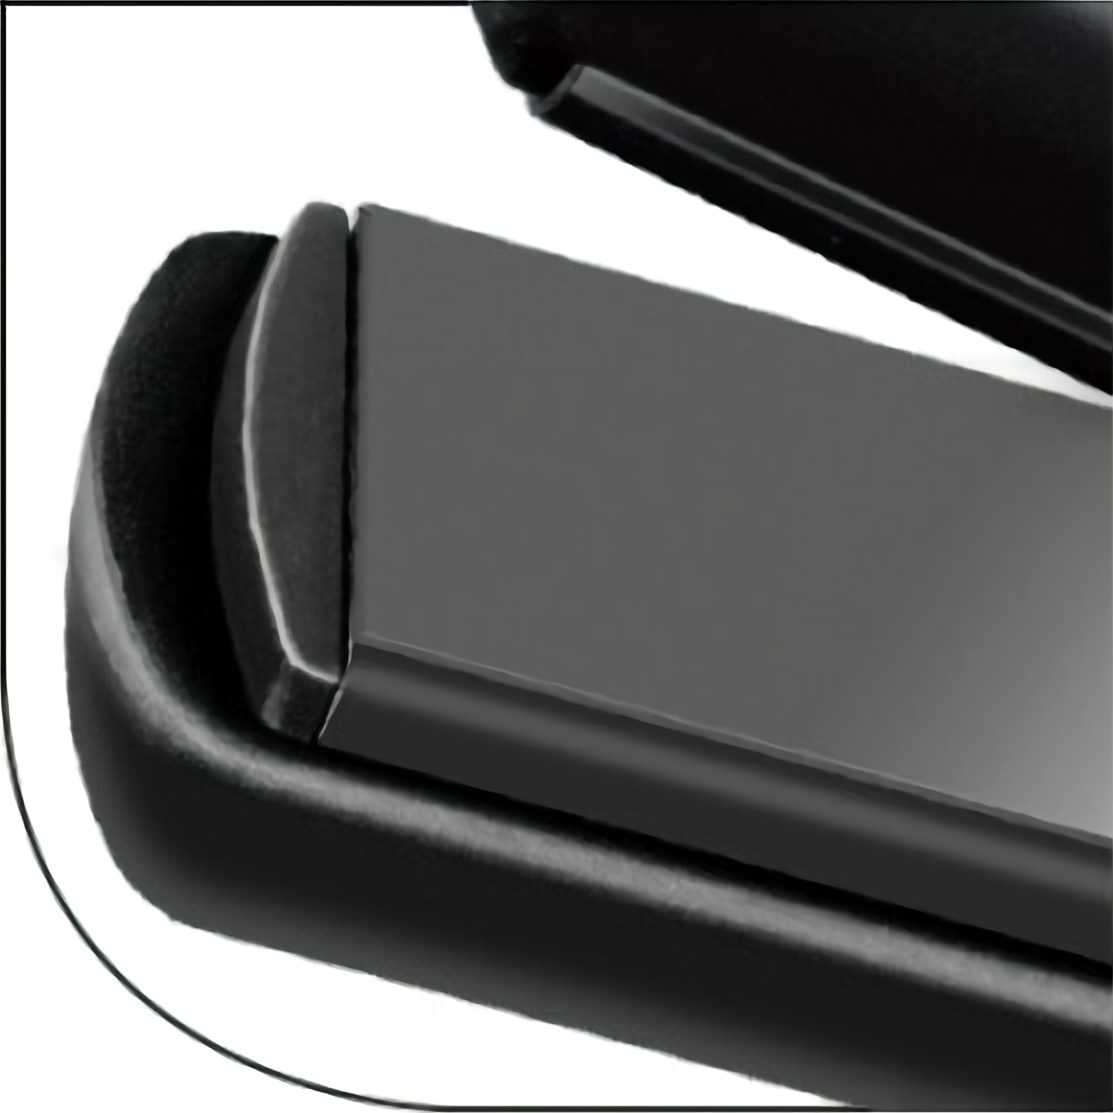 MPM MPR-07 Plancha de pelo de Cerámica Profesional, Anti encrespamiento, 30W